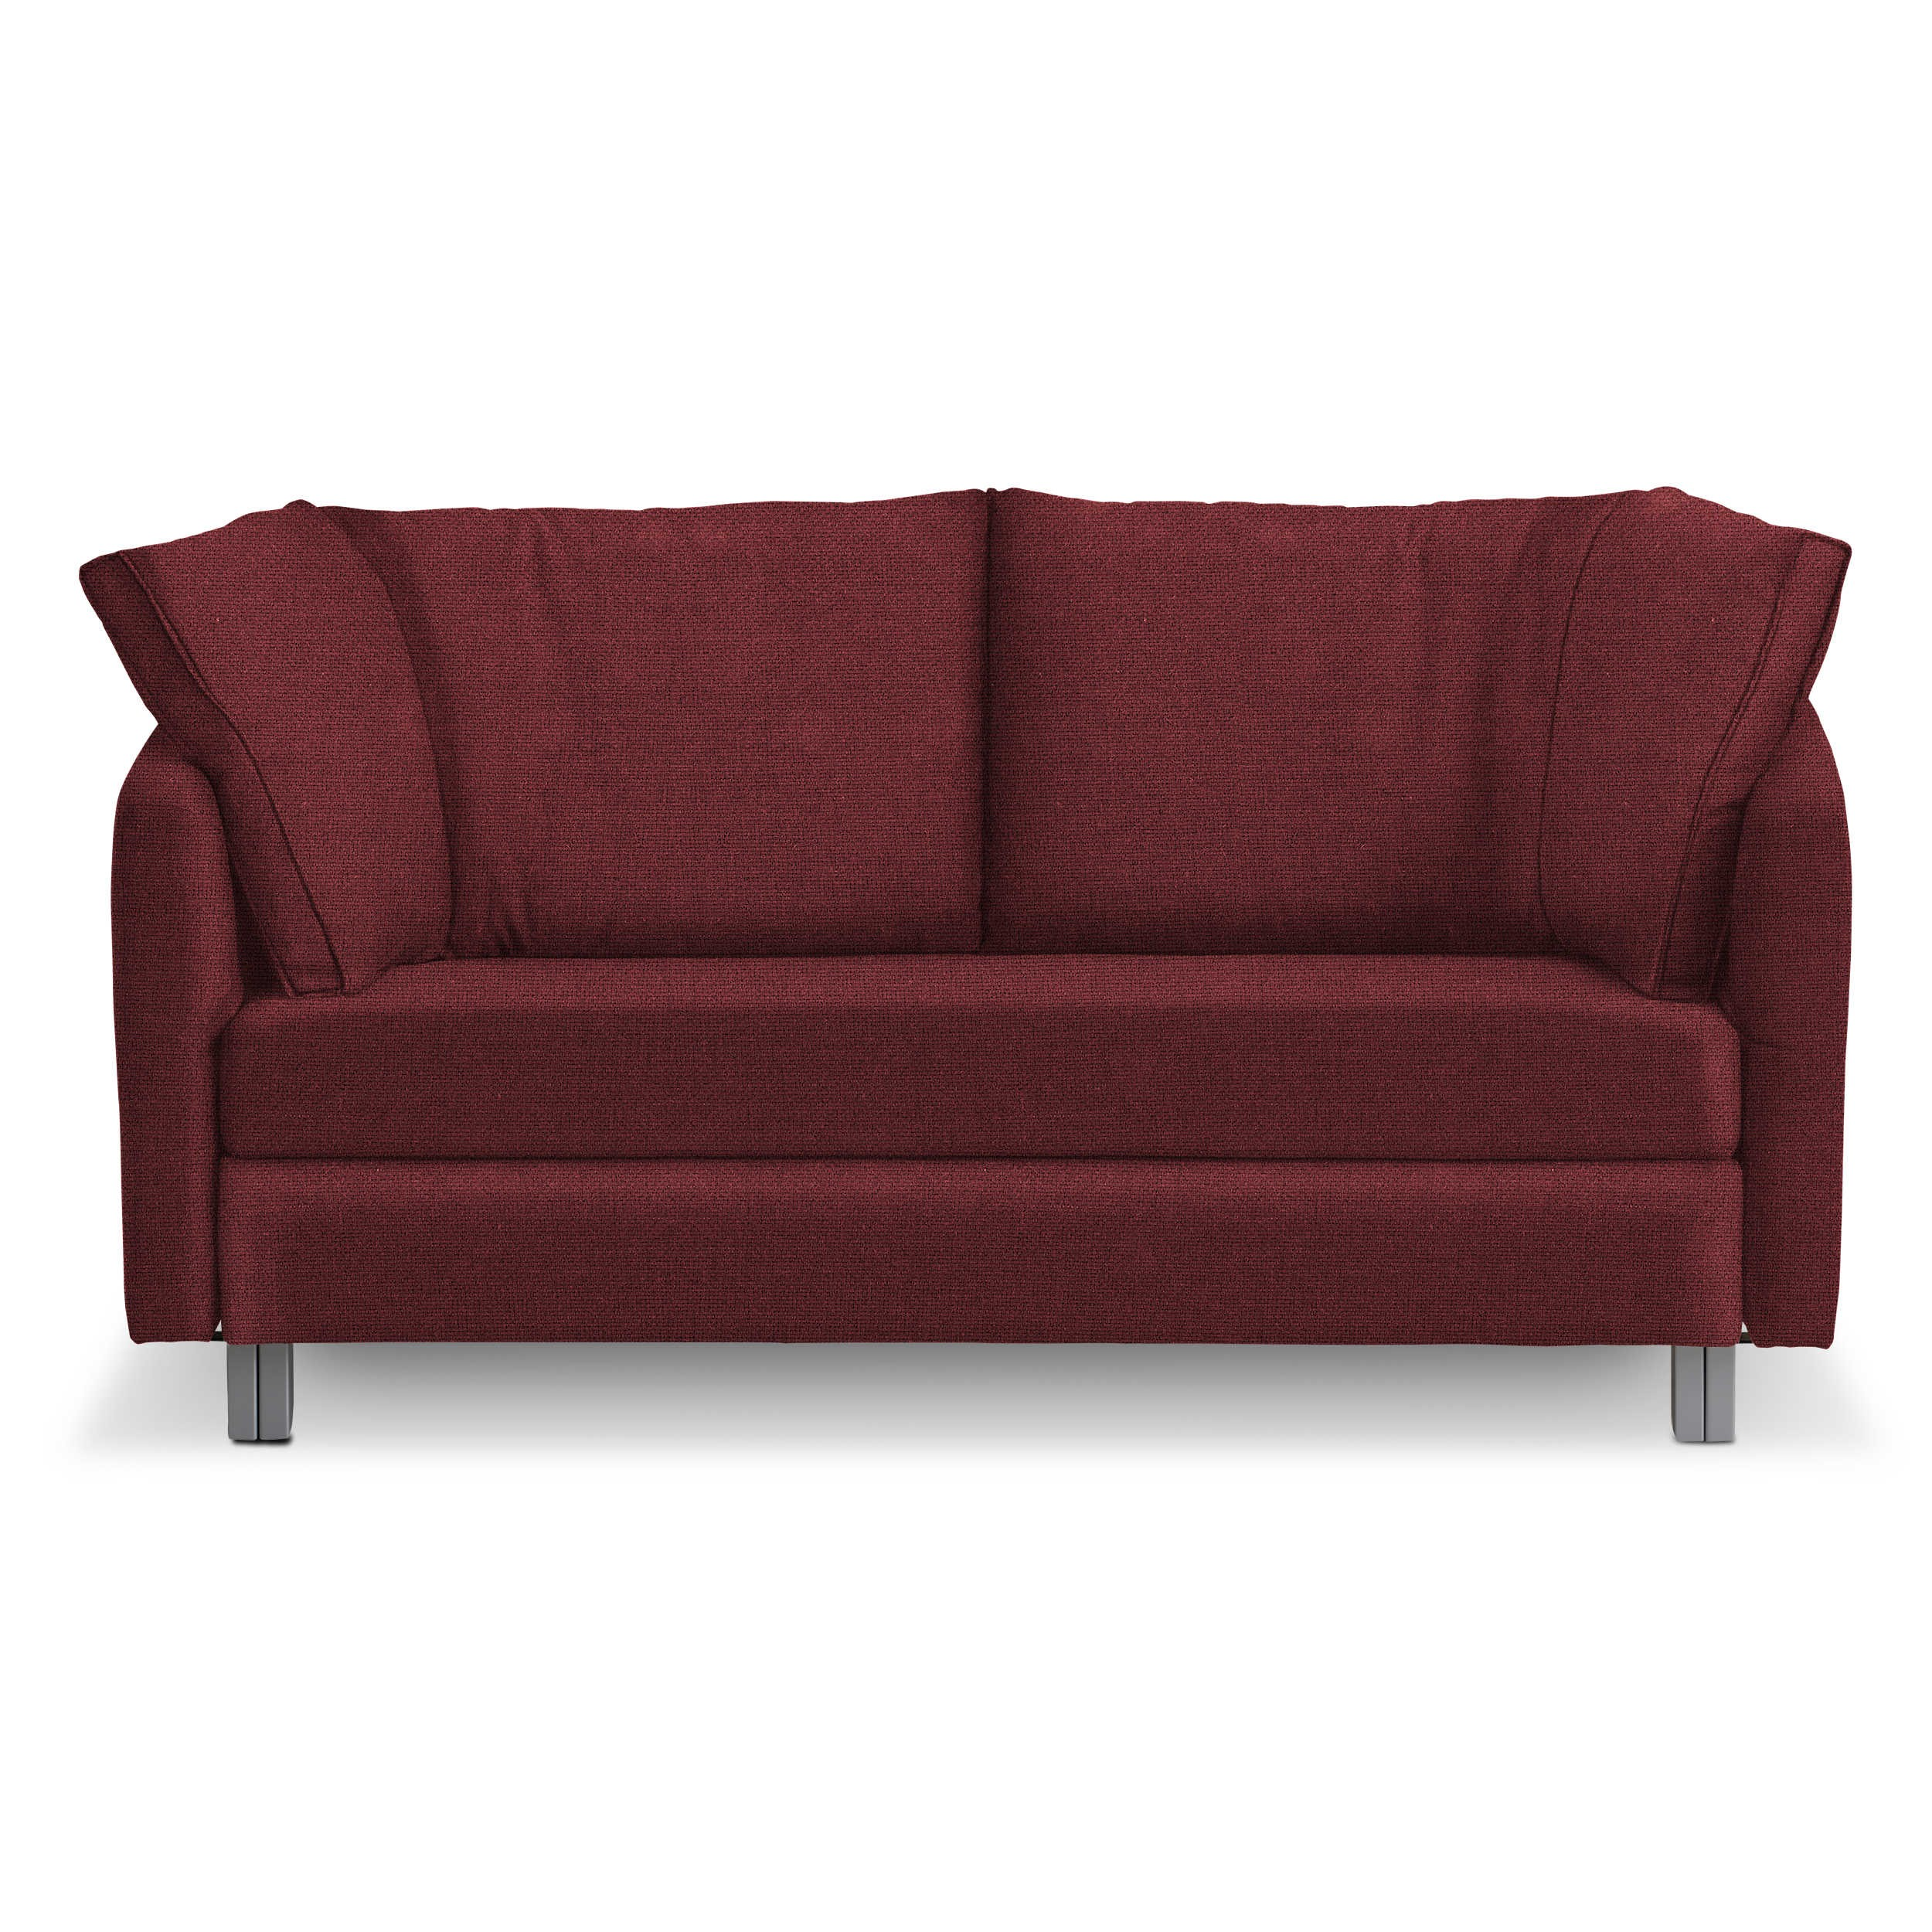 franz fertig schlafsofa mara rot stoff online kaufen bei. Black Bedroom Furniture Sets. Home Design Ideas